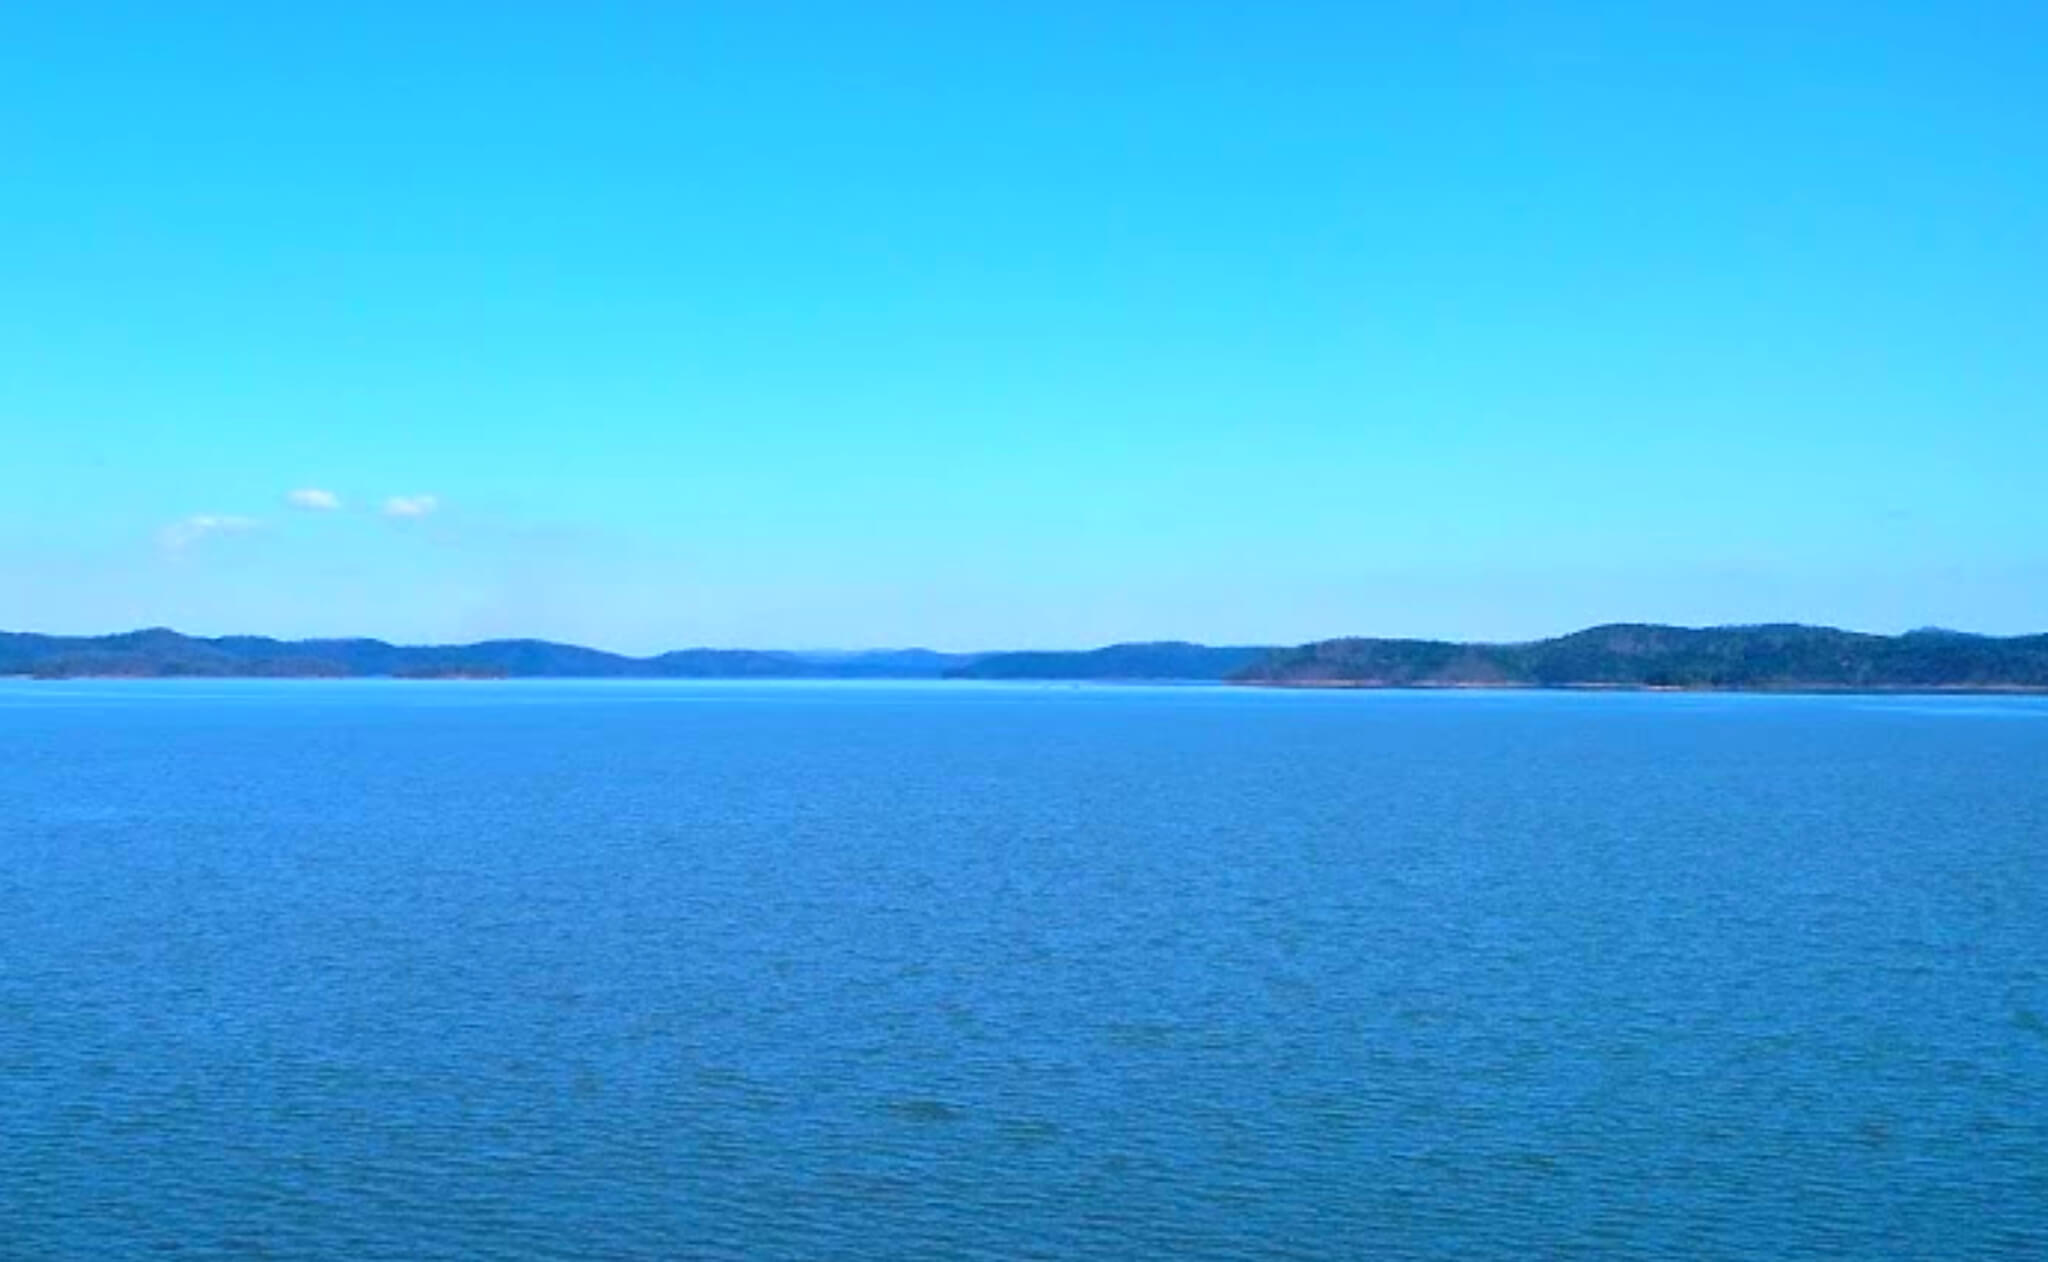 Broken-Bow-Lake-Fishing-Report-Guide-Oklahoma-OK-02